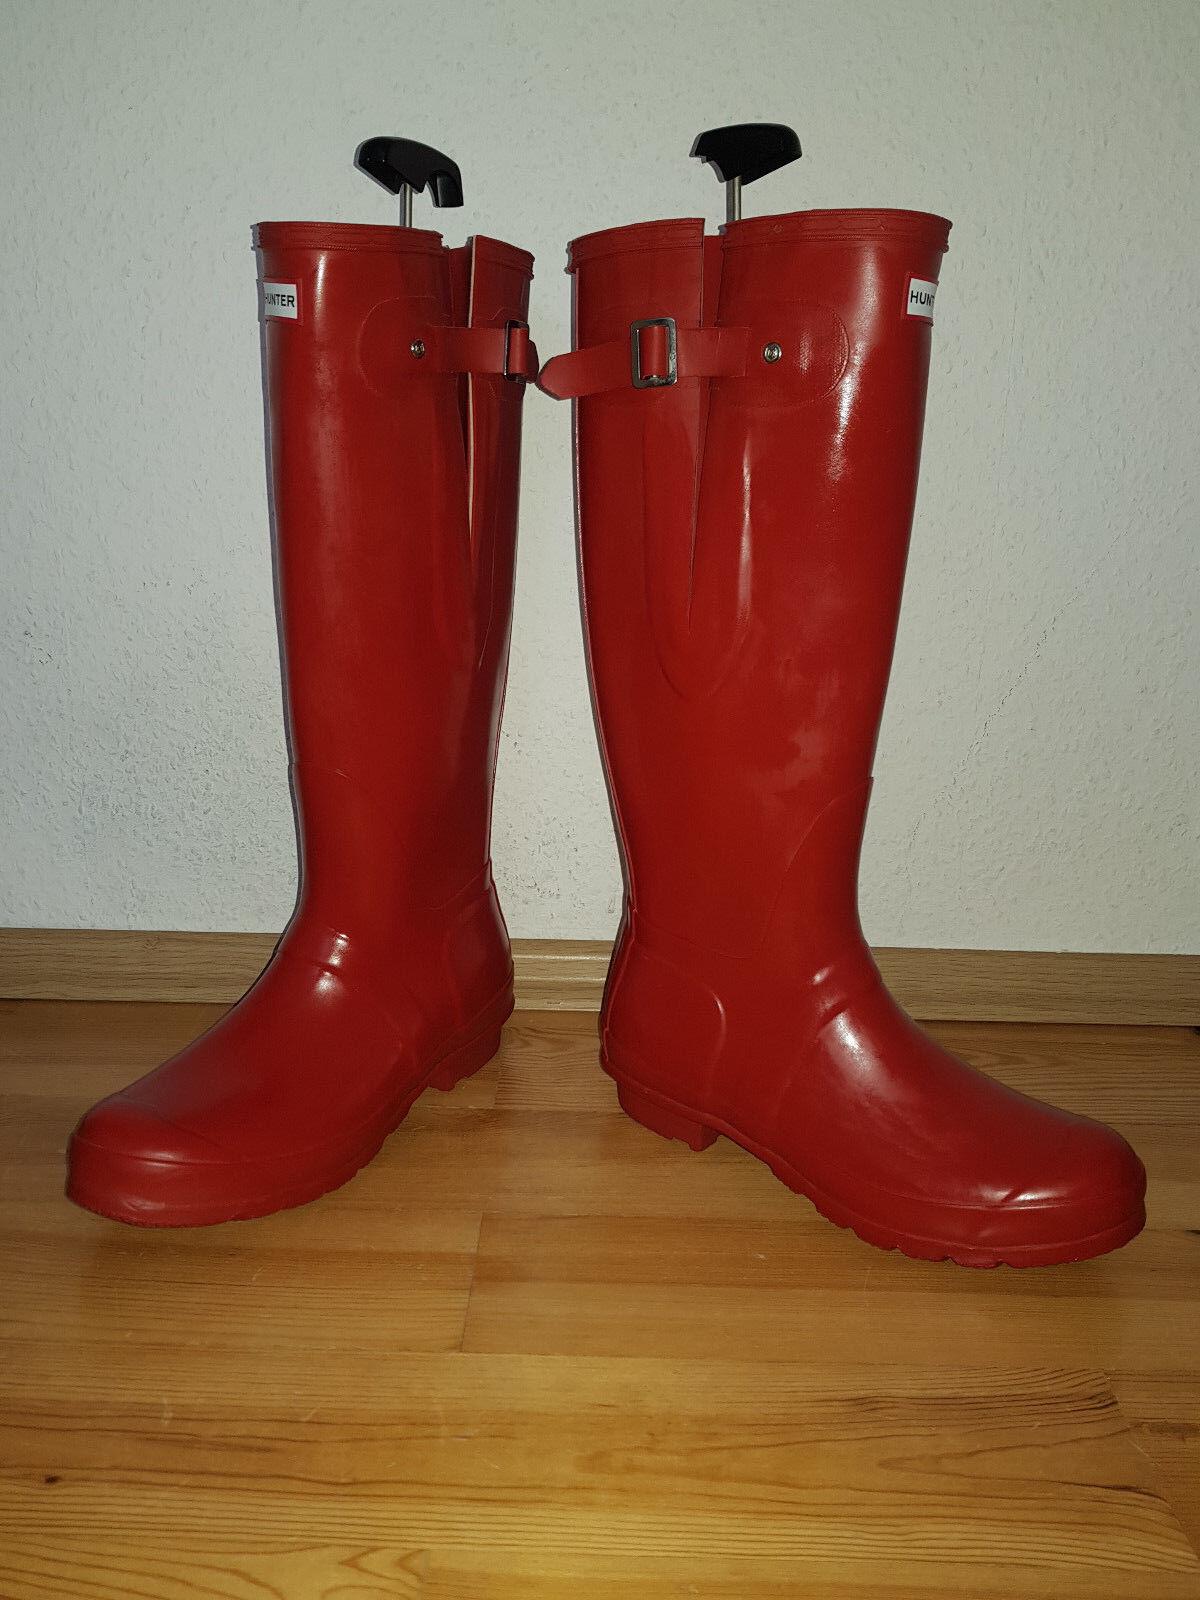 Grandes zapatos con descuento HUNTER Original Adjustable Gummistiefel 7 = 40 - 41 Rot sehr selten Latex NEU